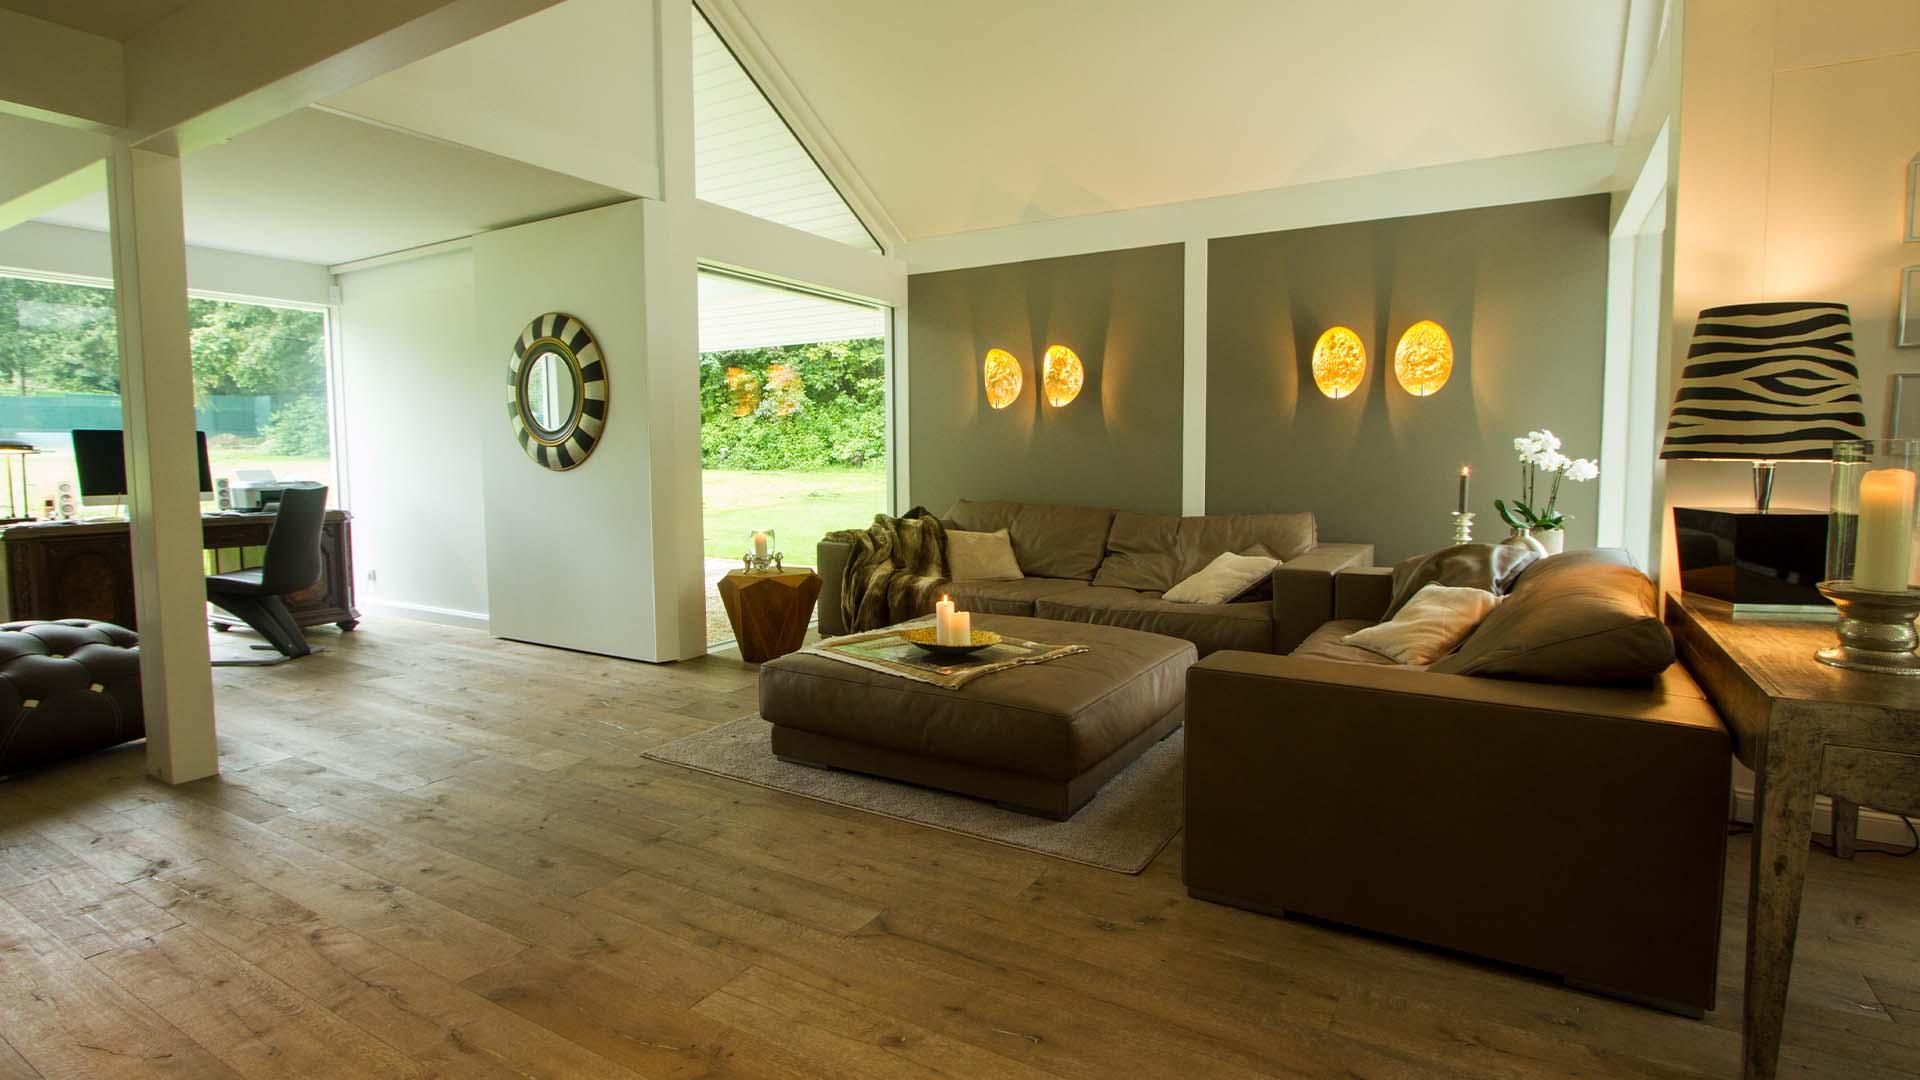 Detmolder Fachwerkhaus – Interieur 02